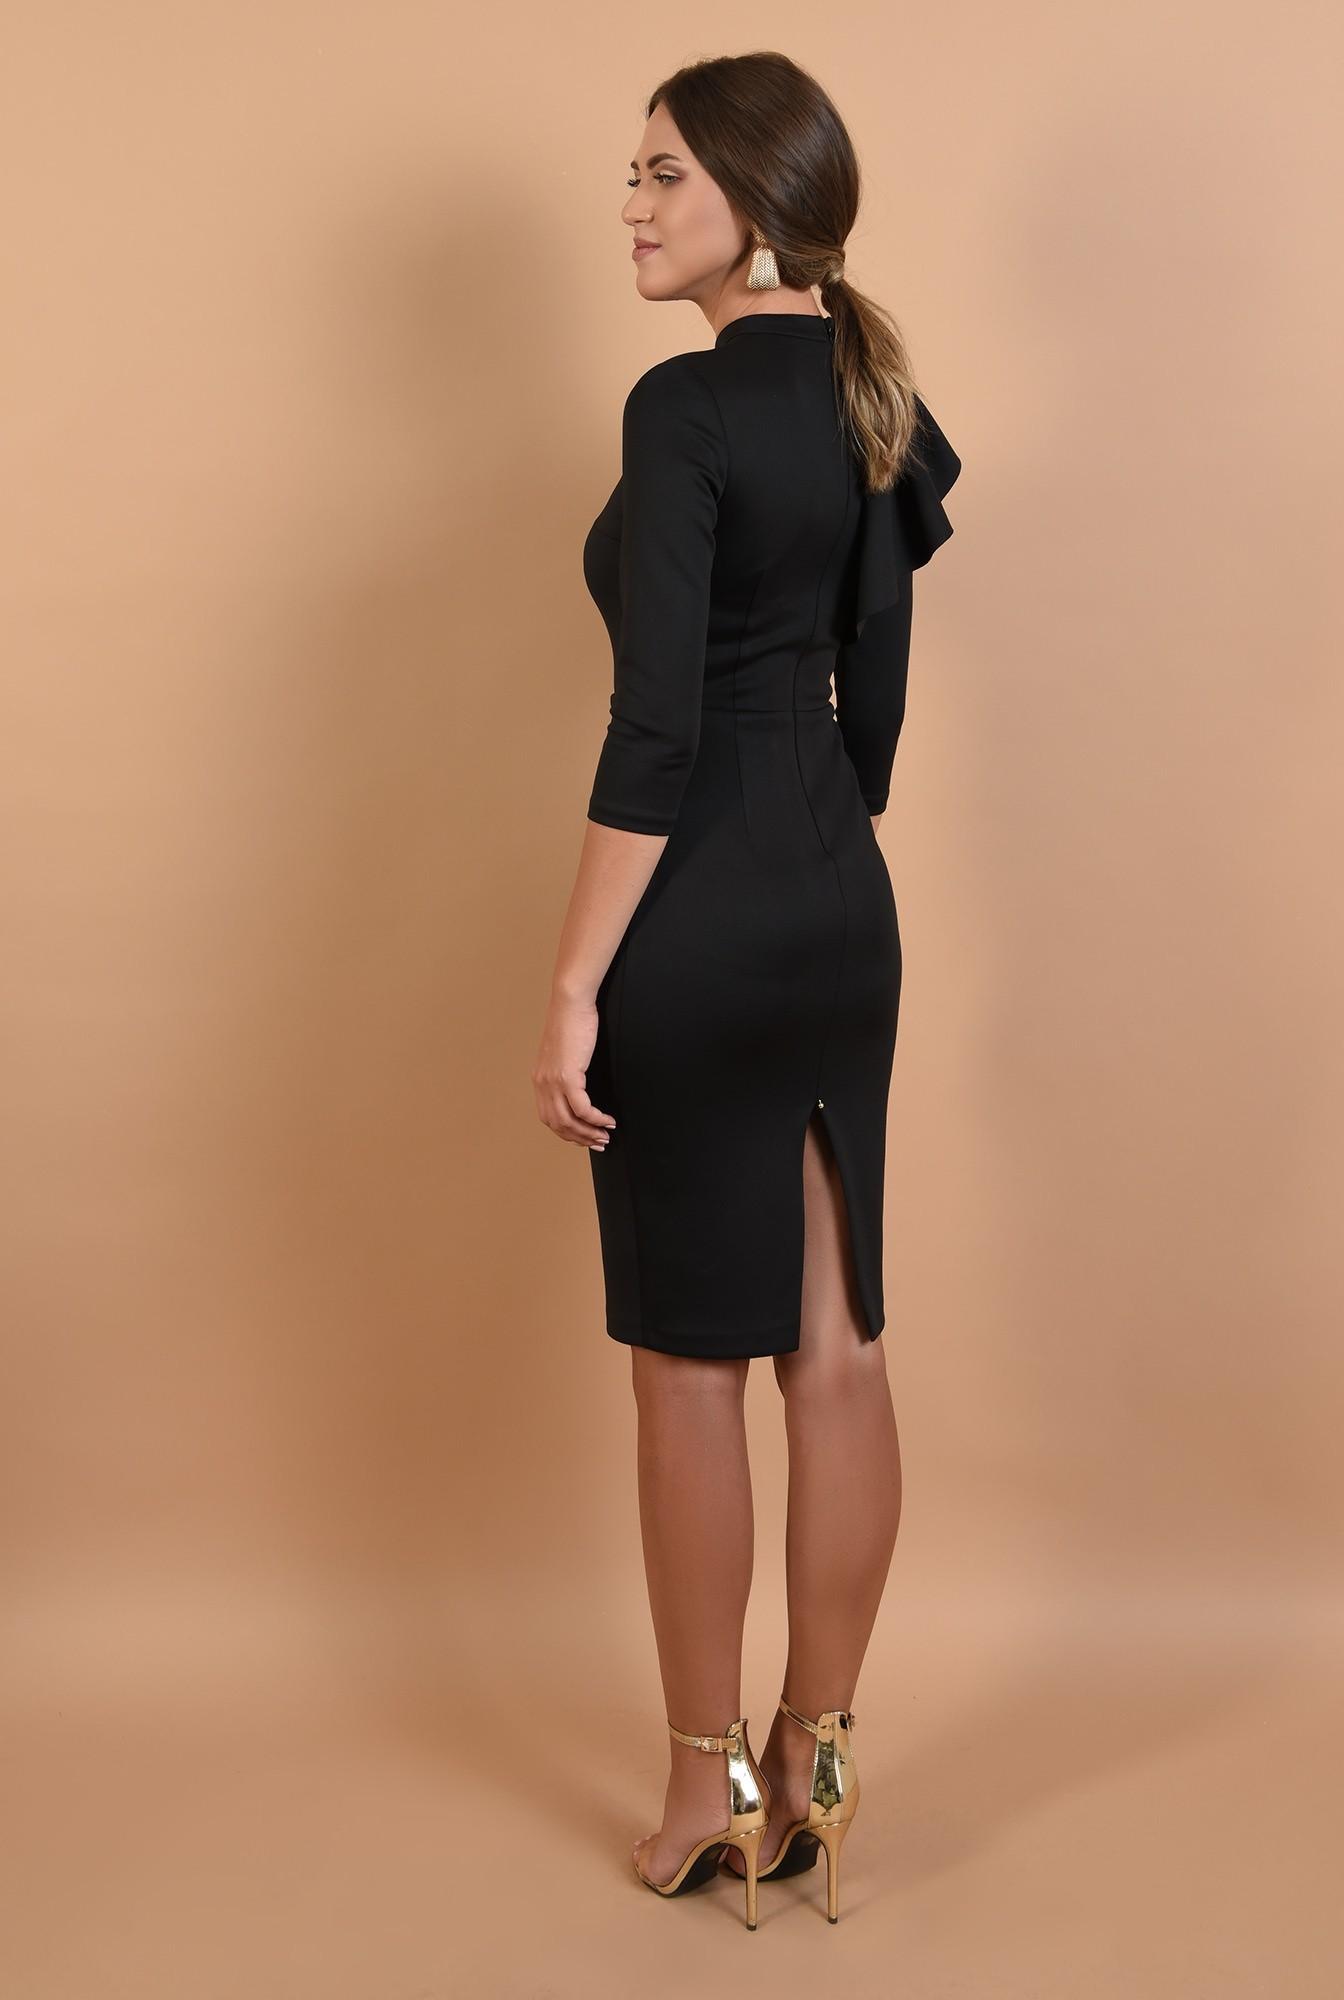 1 - 360 - rochie conica, neagra, midi, aplicatie cu pliuri, guler inalt, Poema